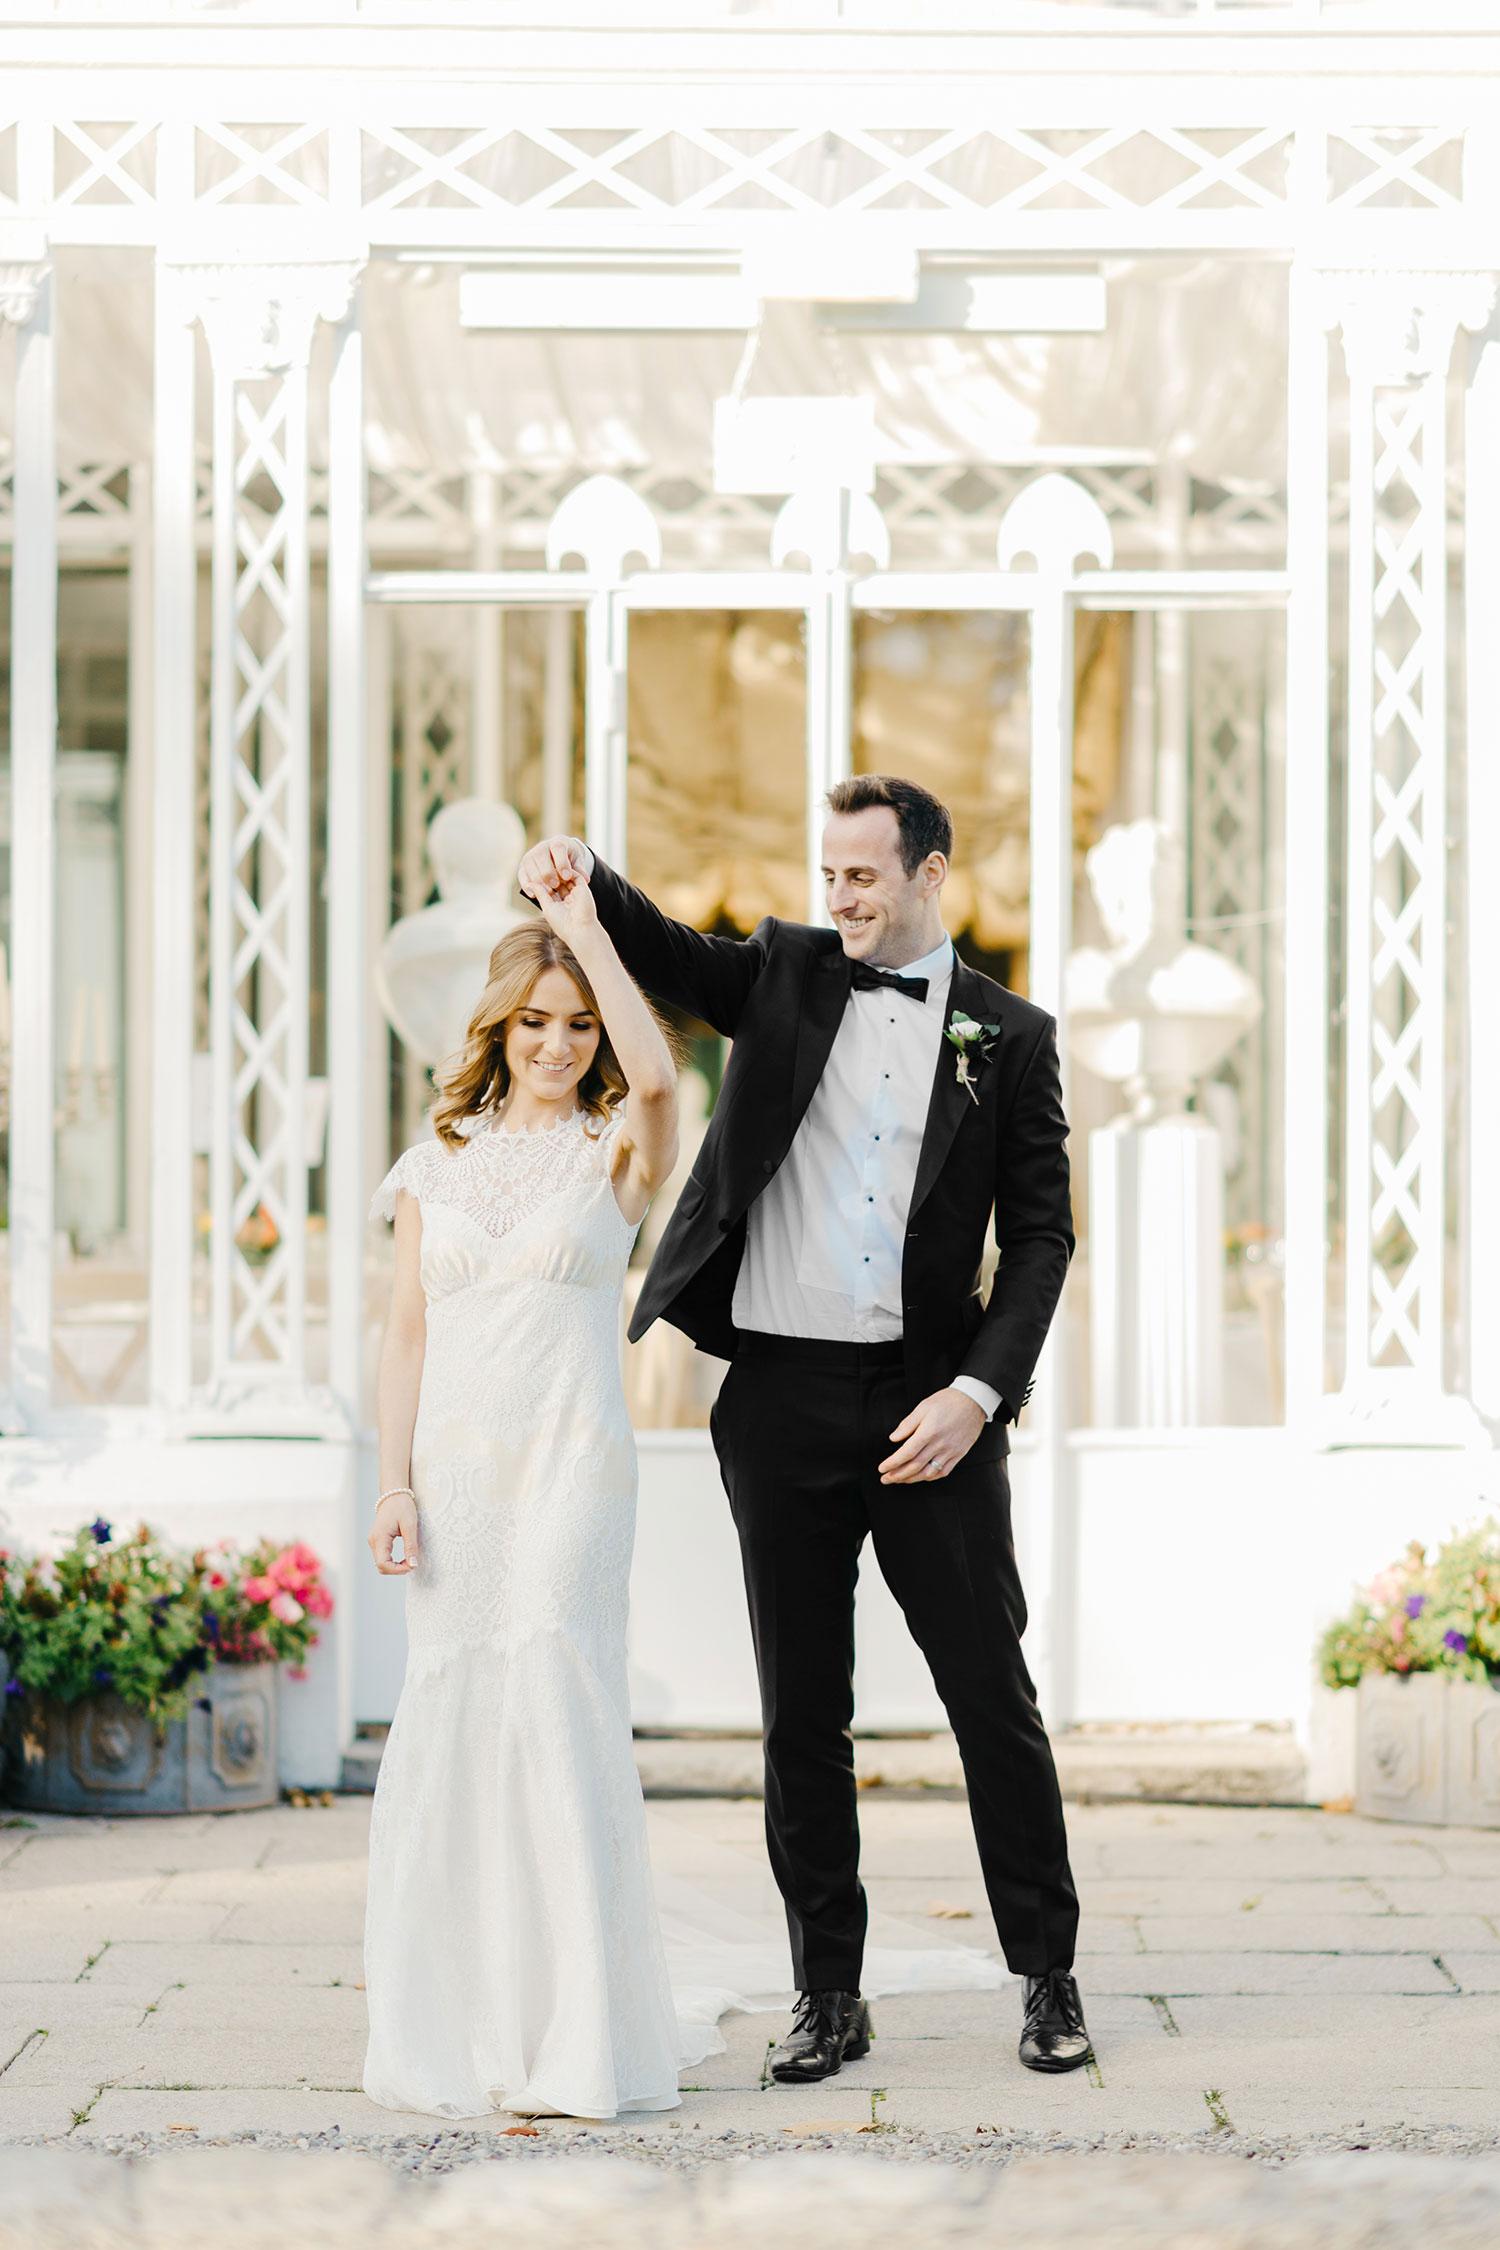 bellinter-house-wedding-photographer-0069_0069.jpg